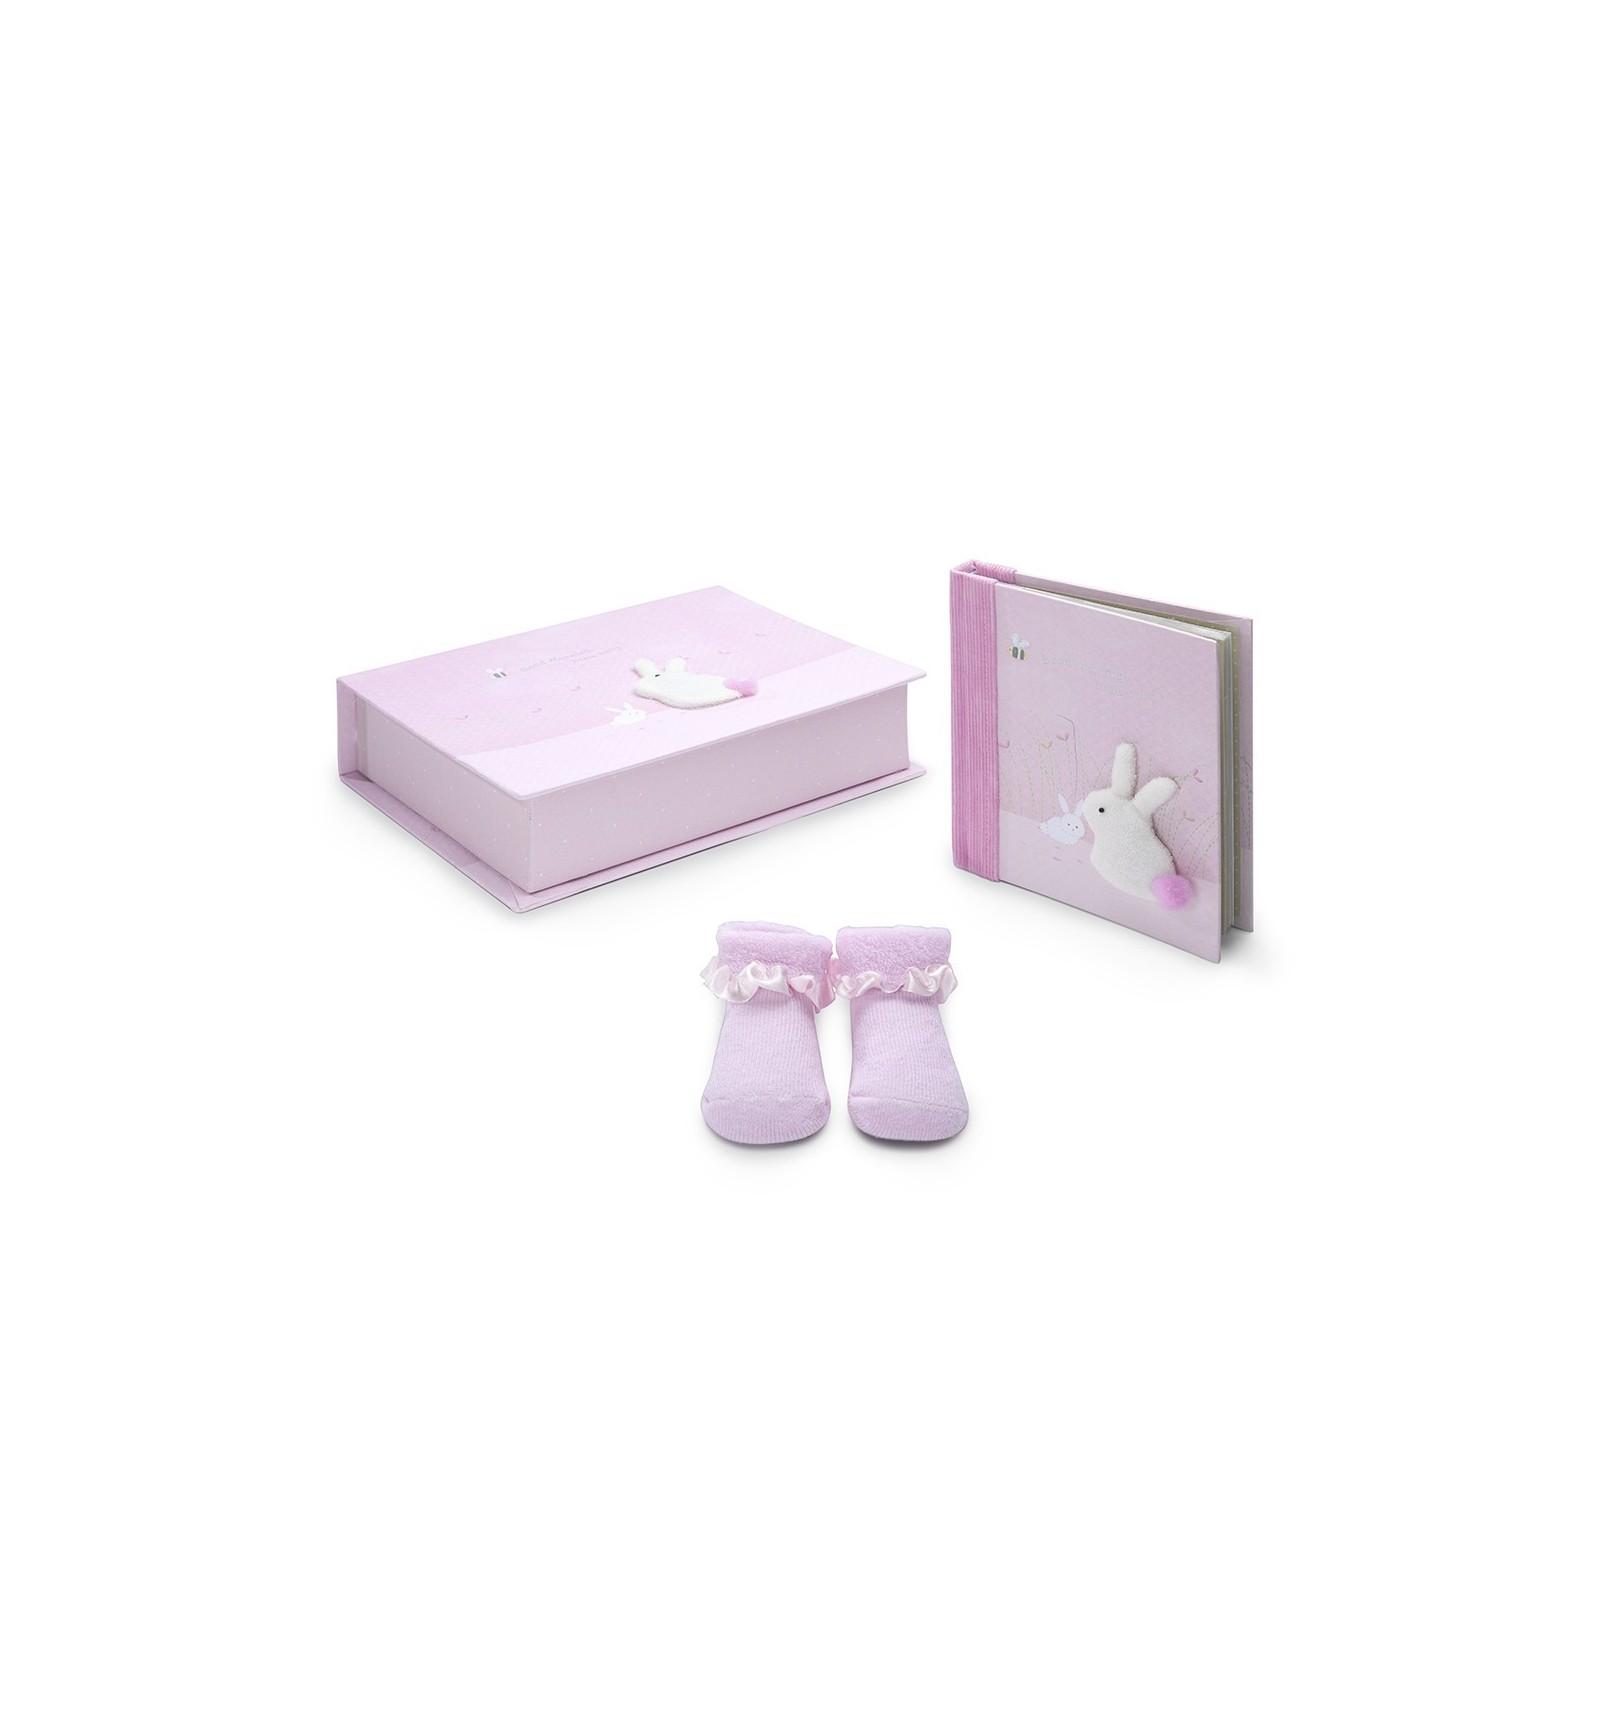 nursery accessories newborn gifts bebé de parís baby gifts